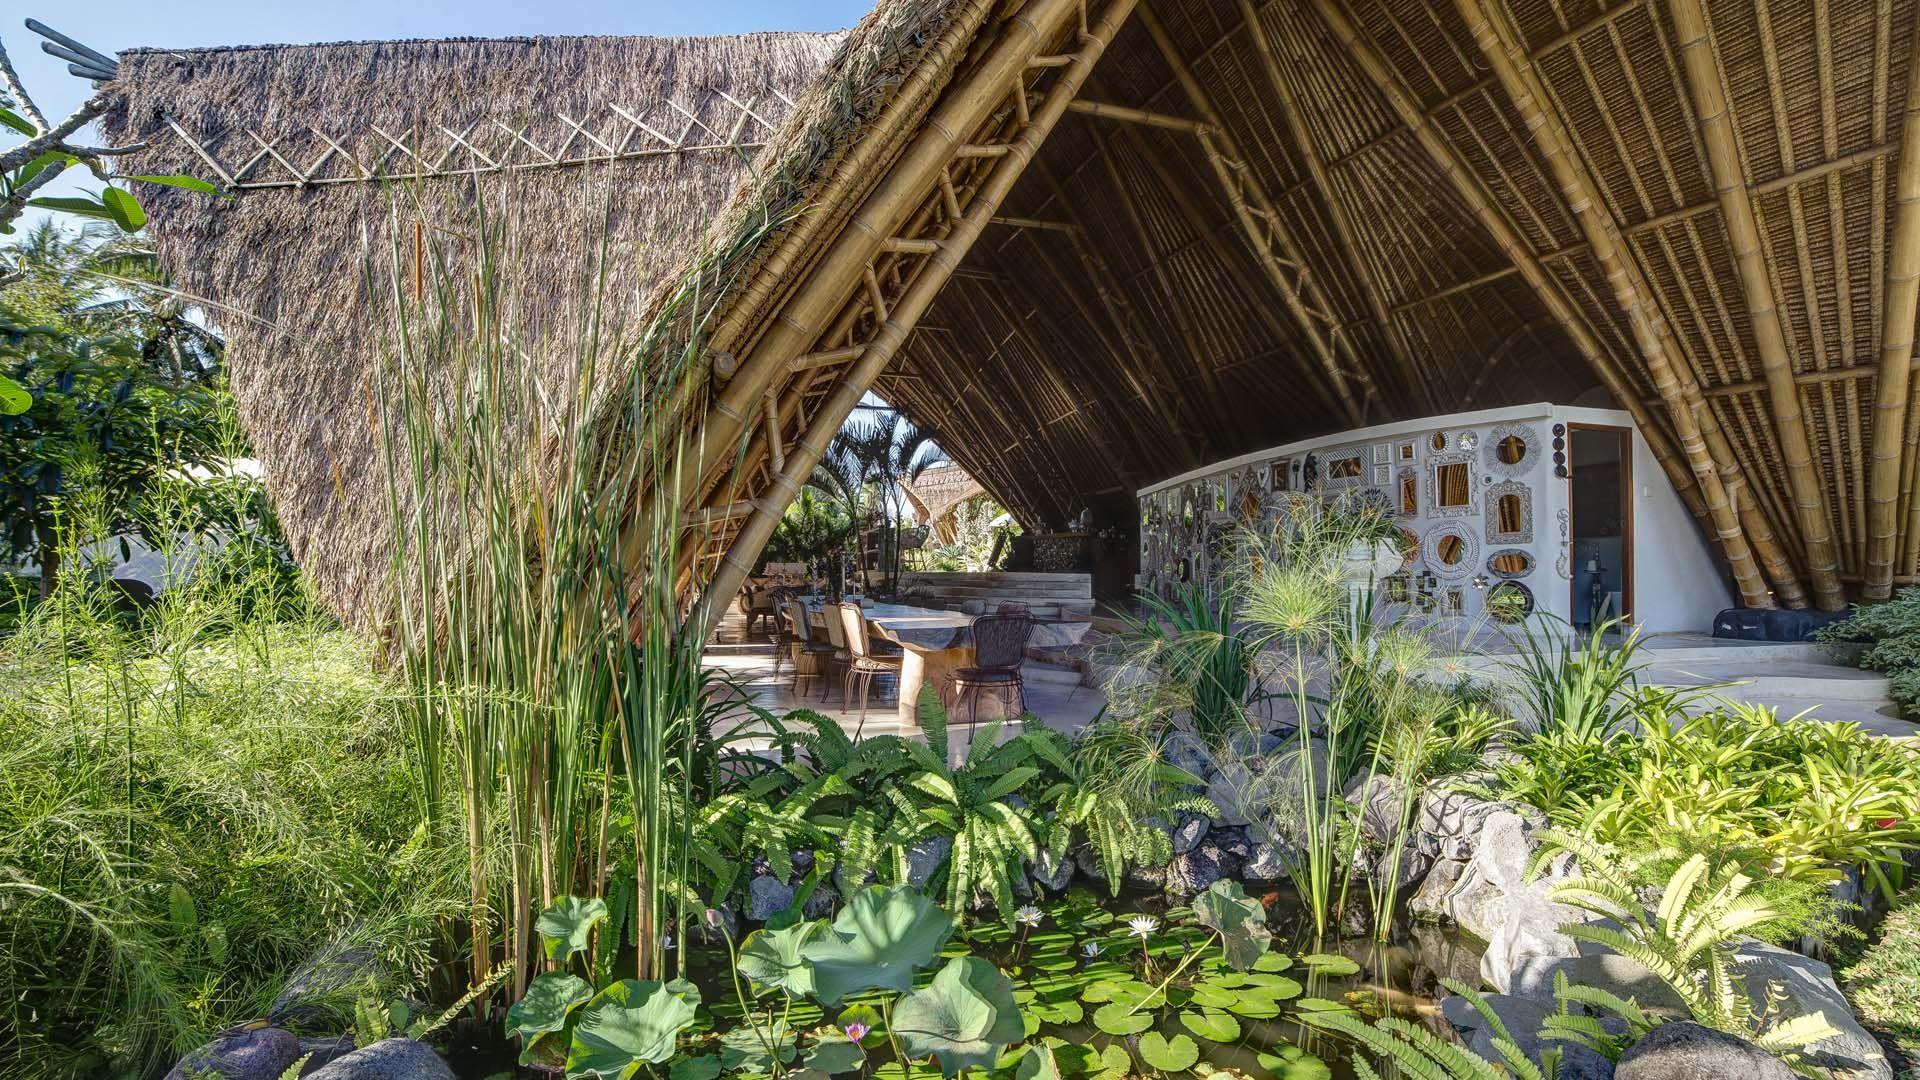 Sandat Glamping Tents - Bali